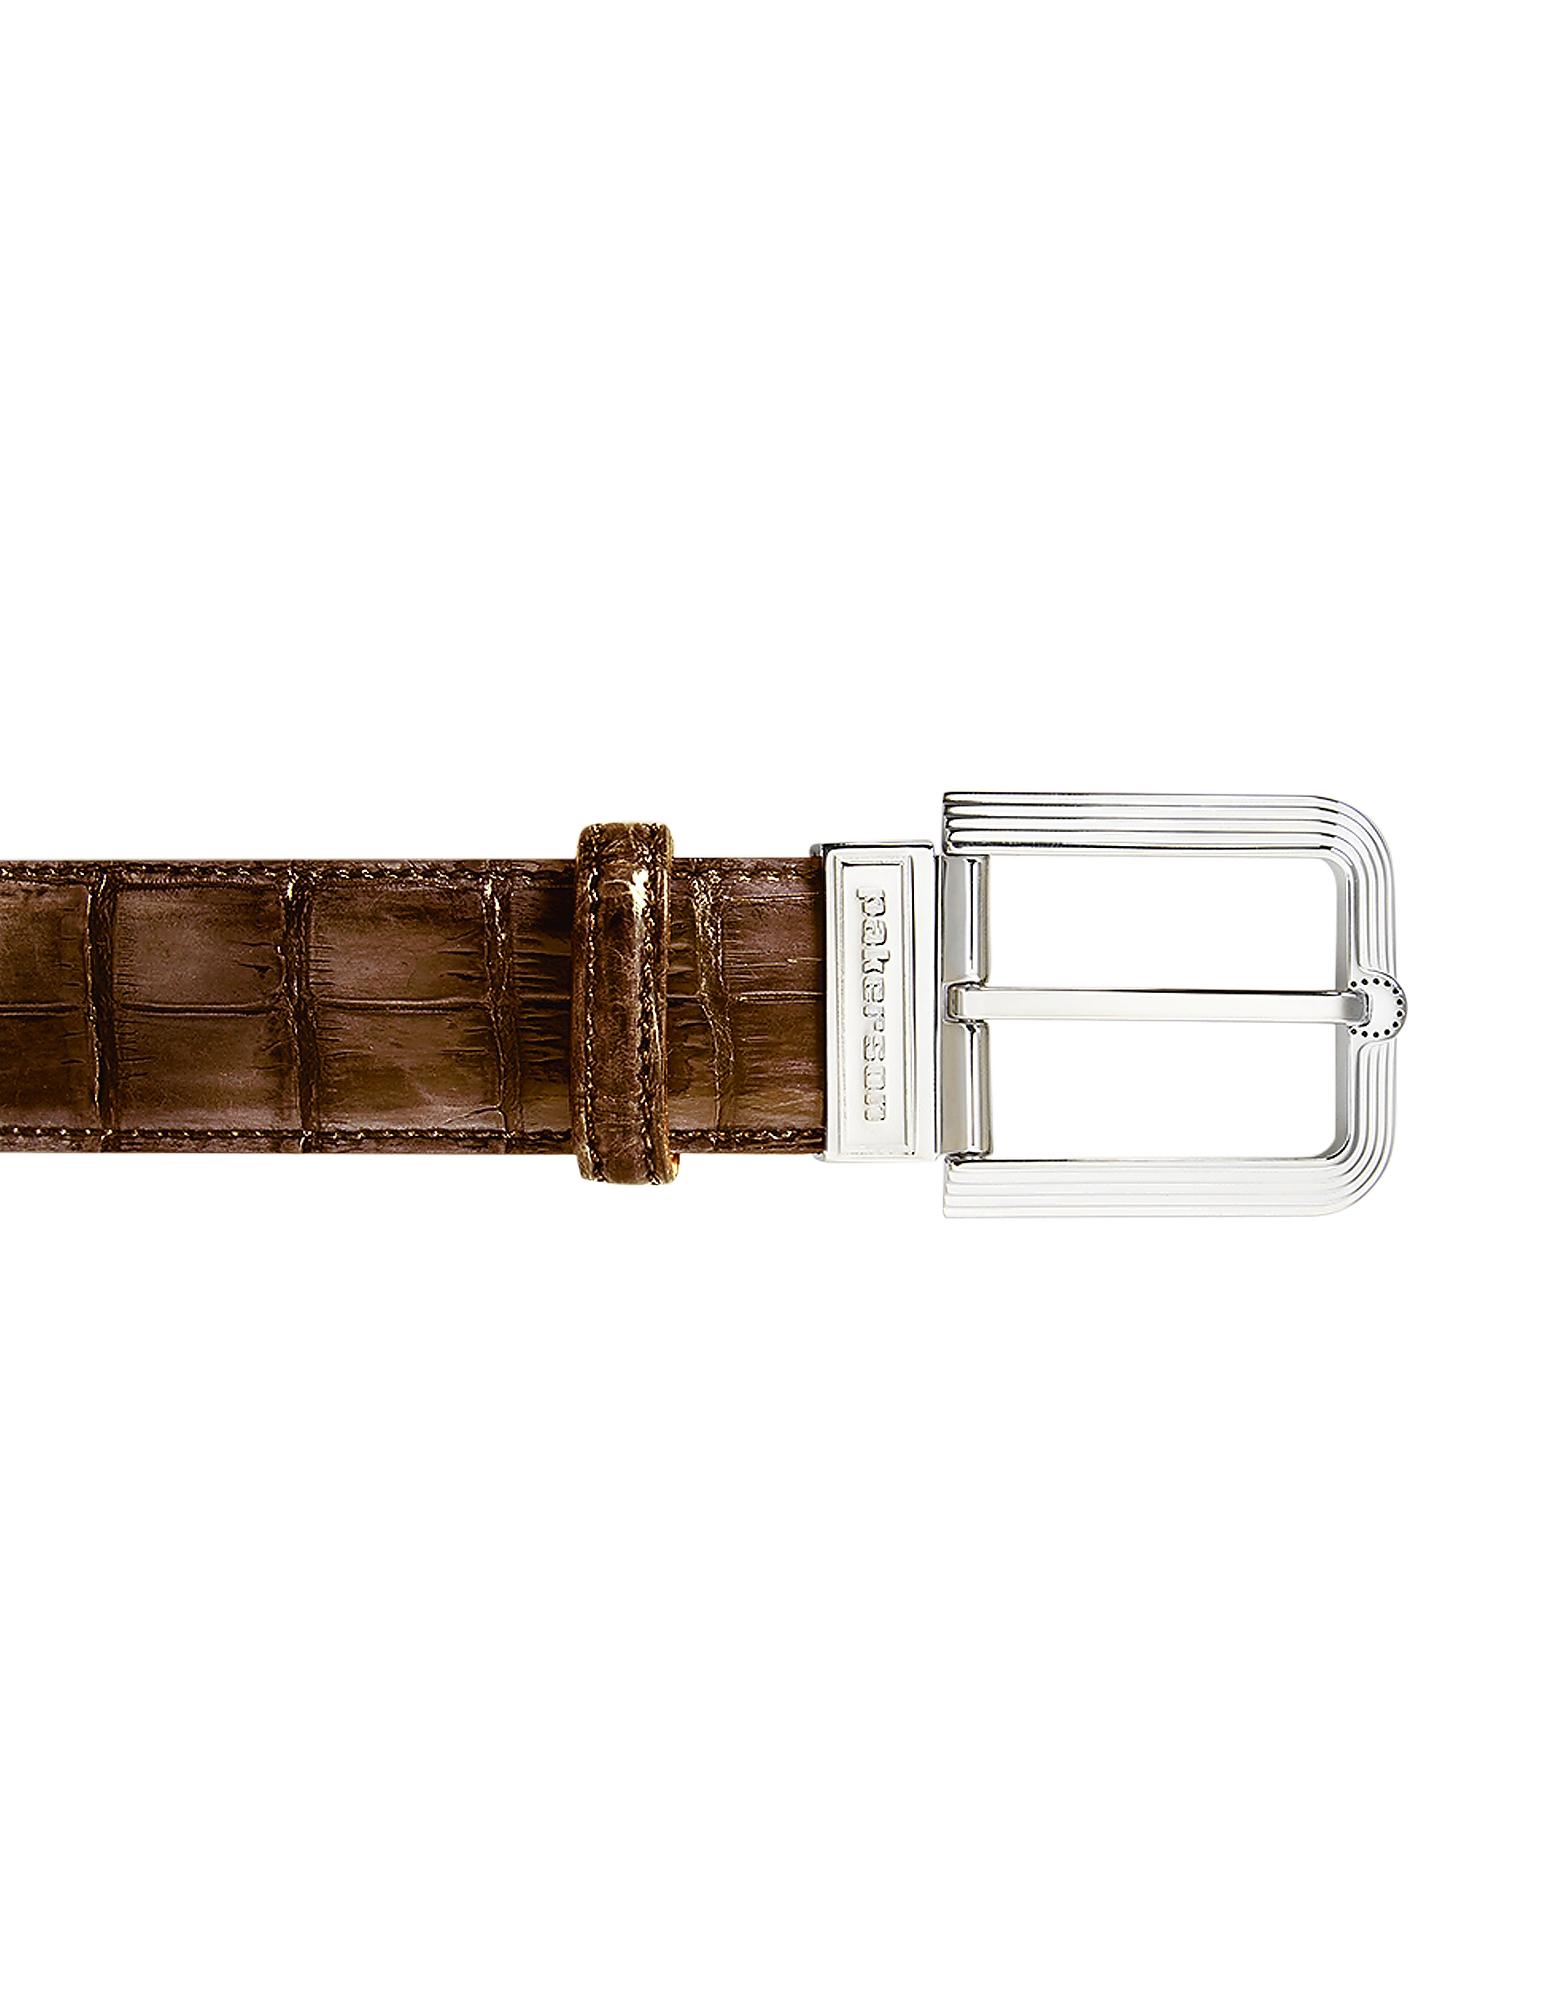 Fiesole Timber Alligator Leather Belt w/ Silver Buckle, Brown